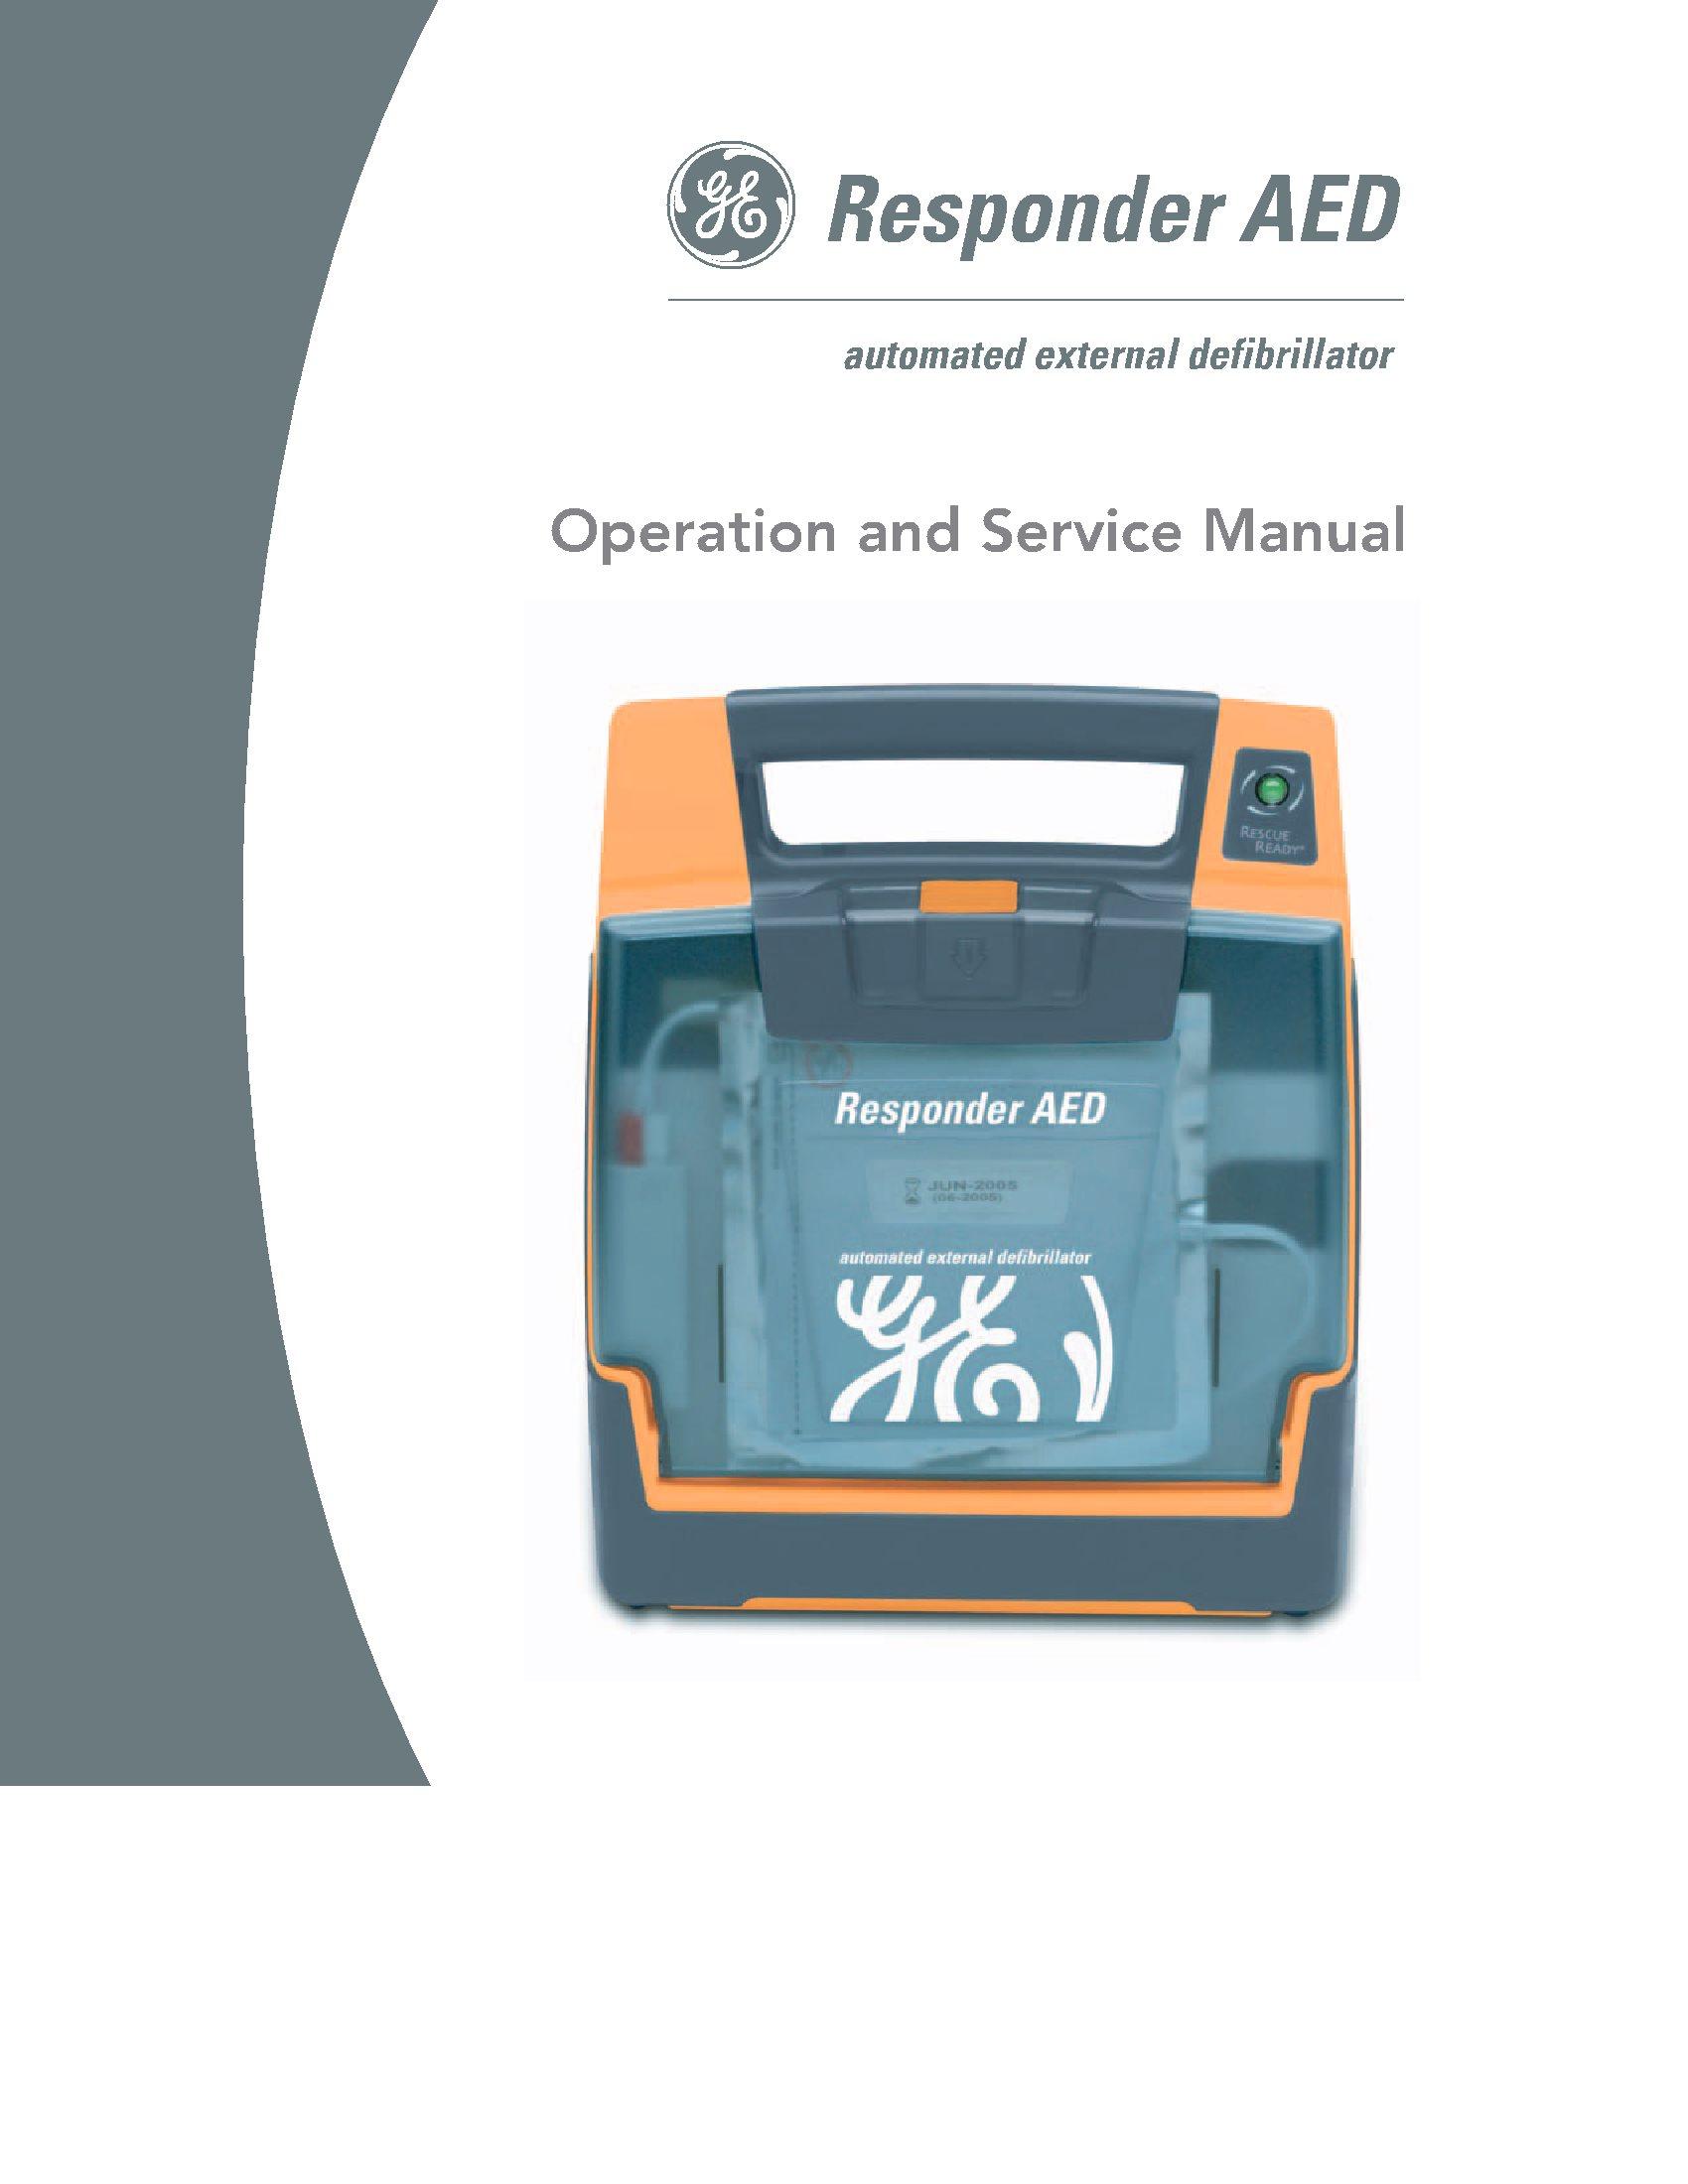 GE Responder AED Service manual